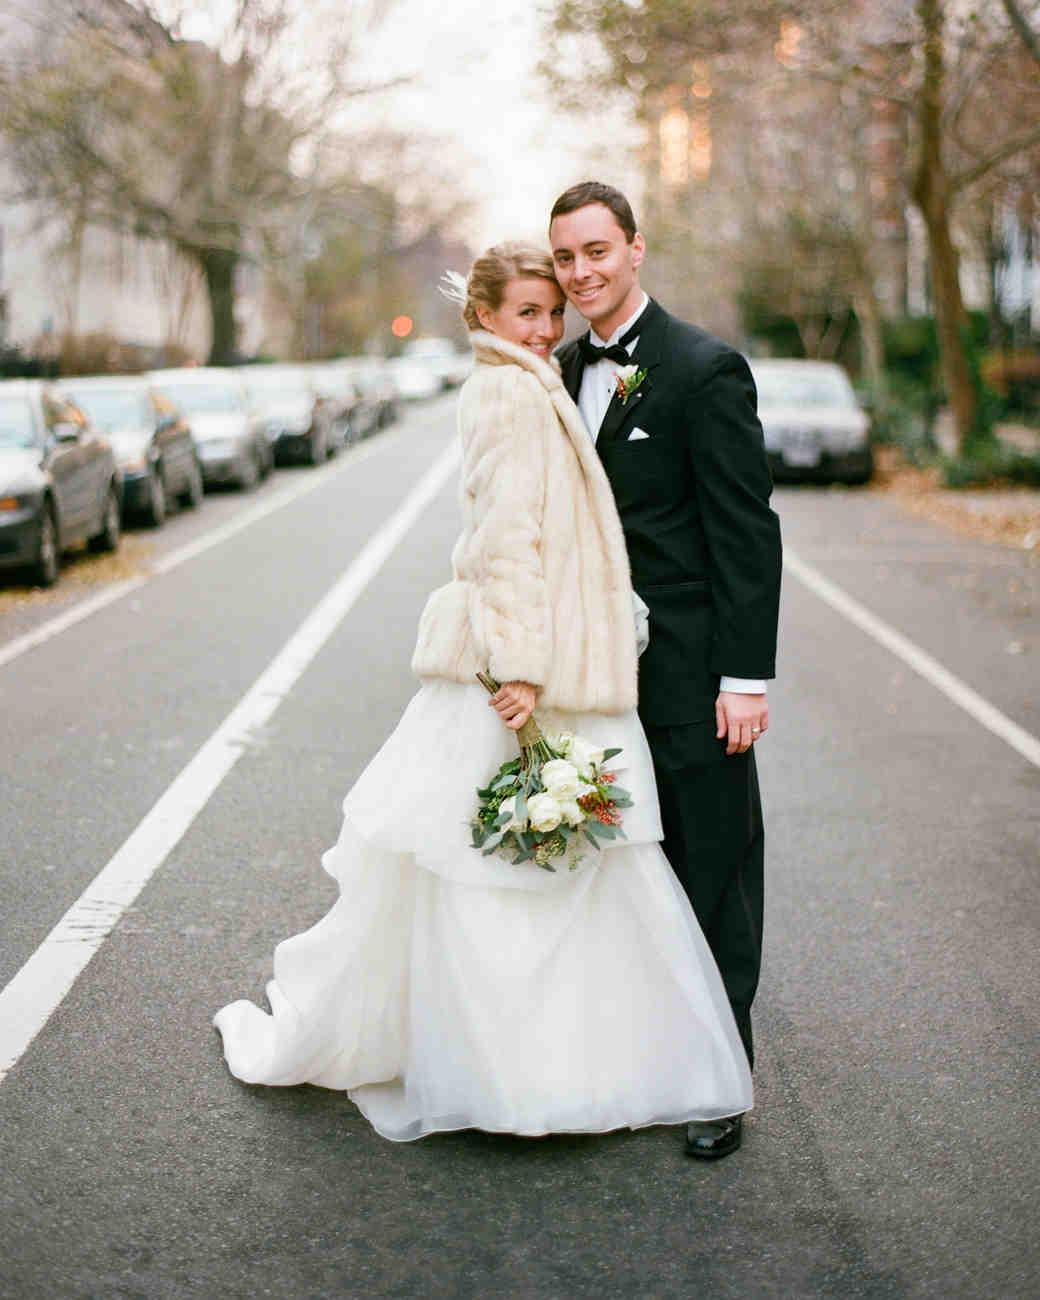 real-weddings-jess-greg-0811-484.jpg